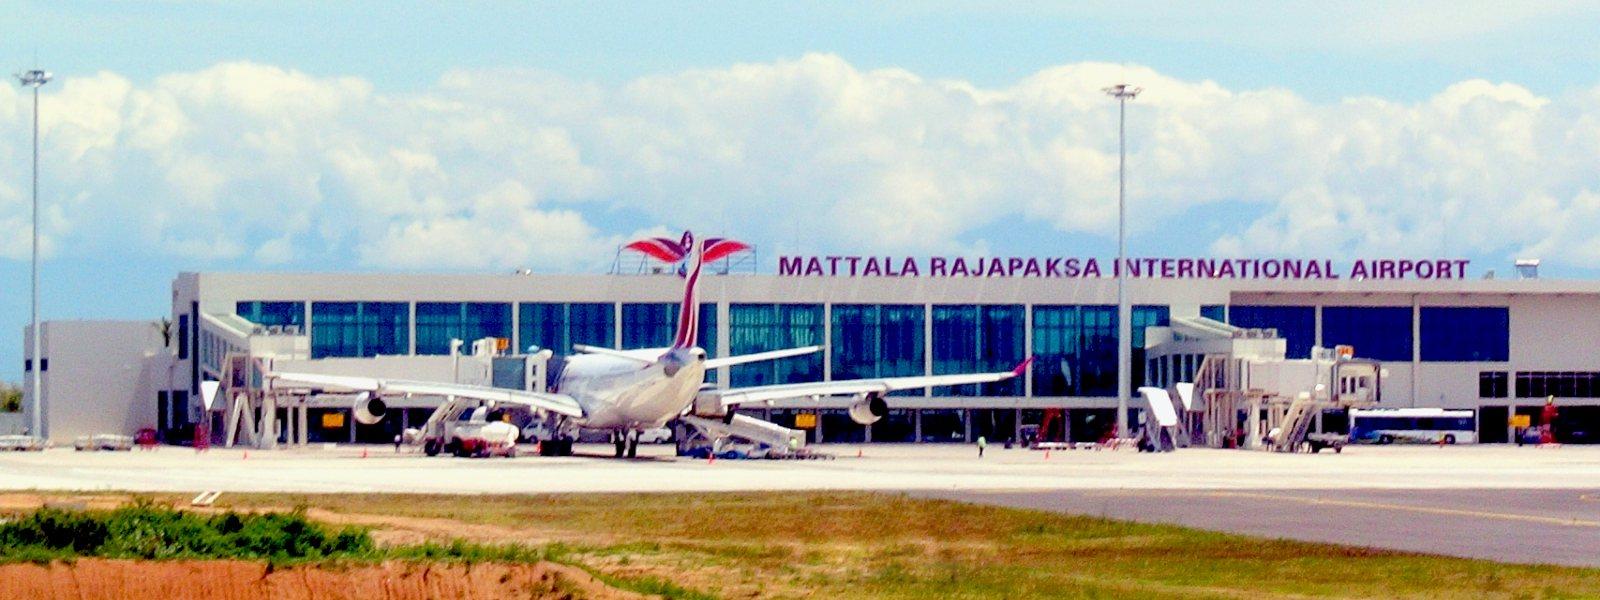 Mattala becoming hot spot for ship crew transfers